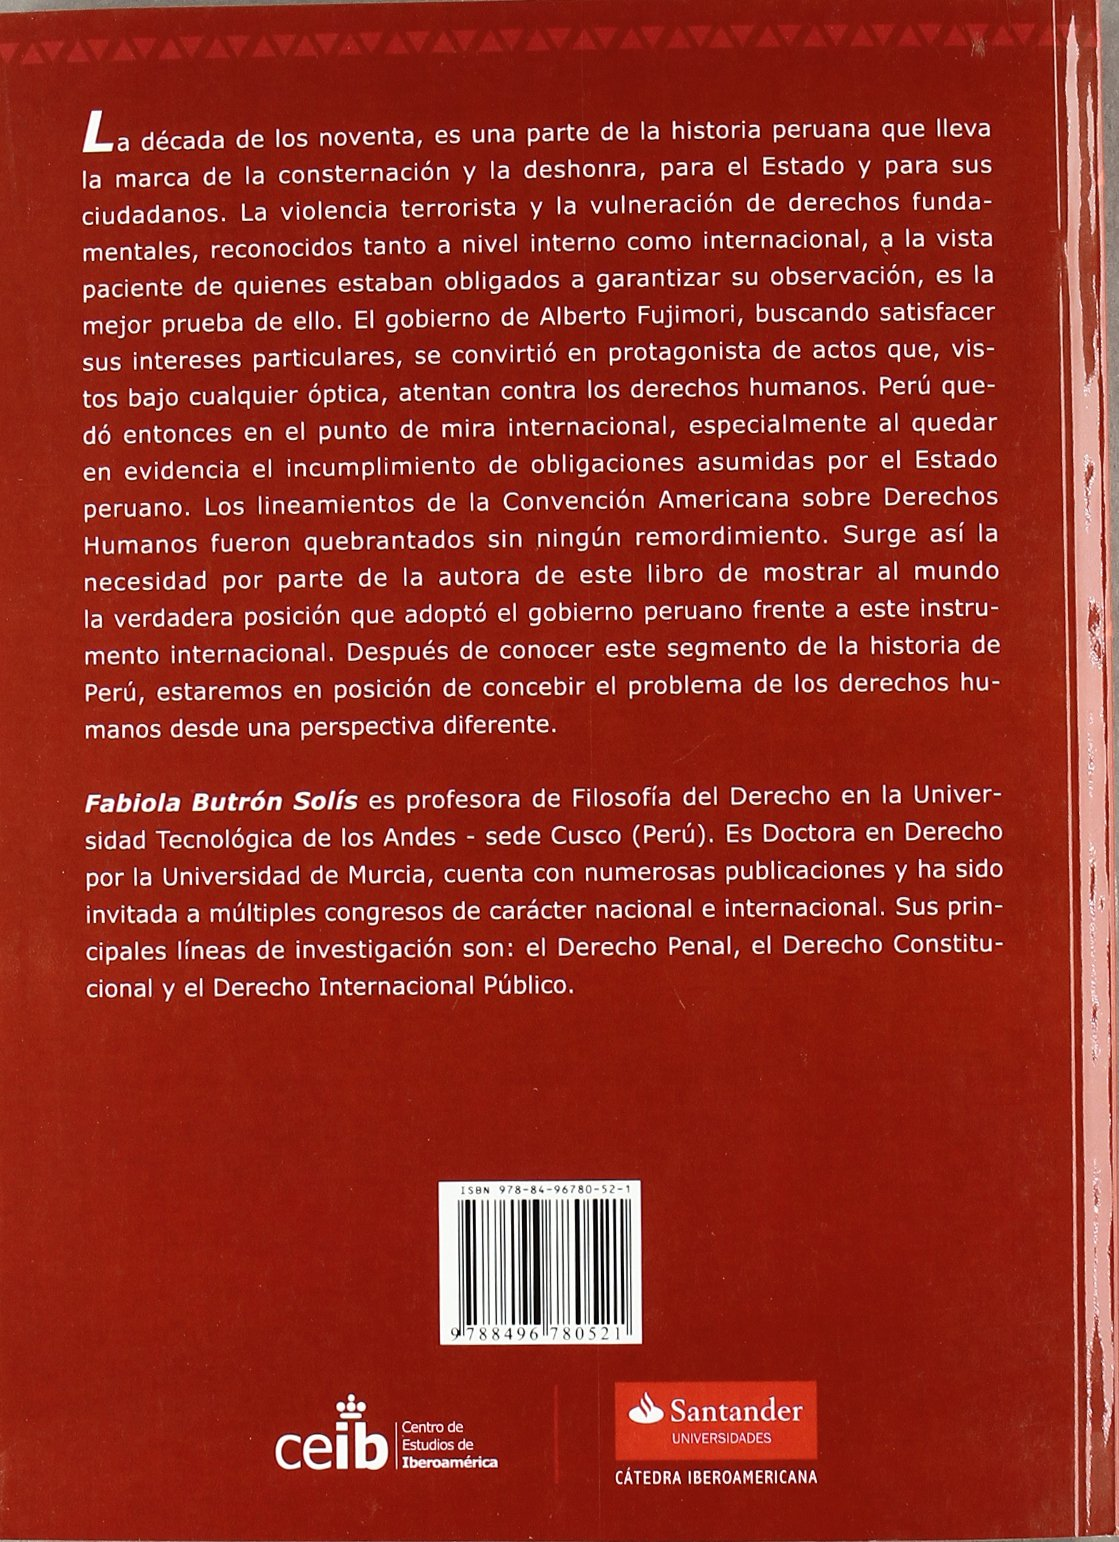 LA NEGACION DE LOS DERECHOS HUMANOS (Monografias Iberoamericanas Ceib) (Spanish Edition)